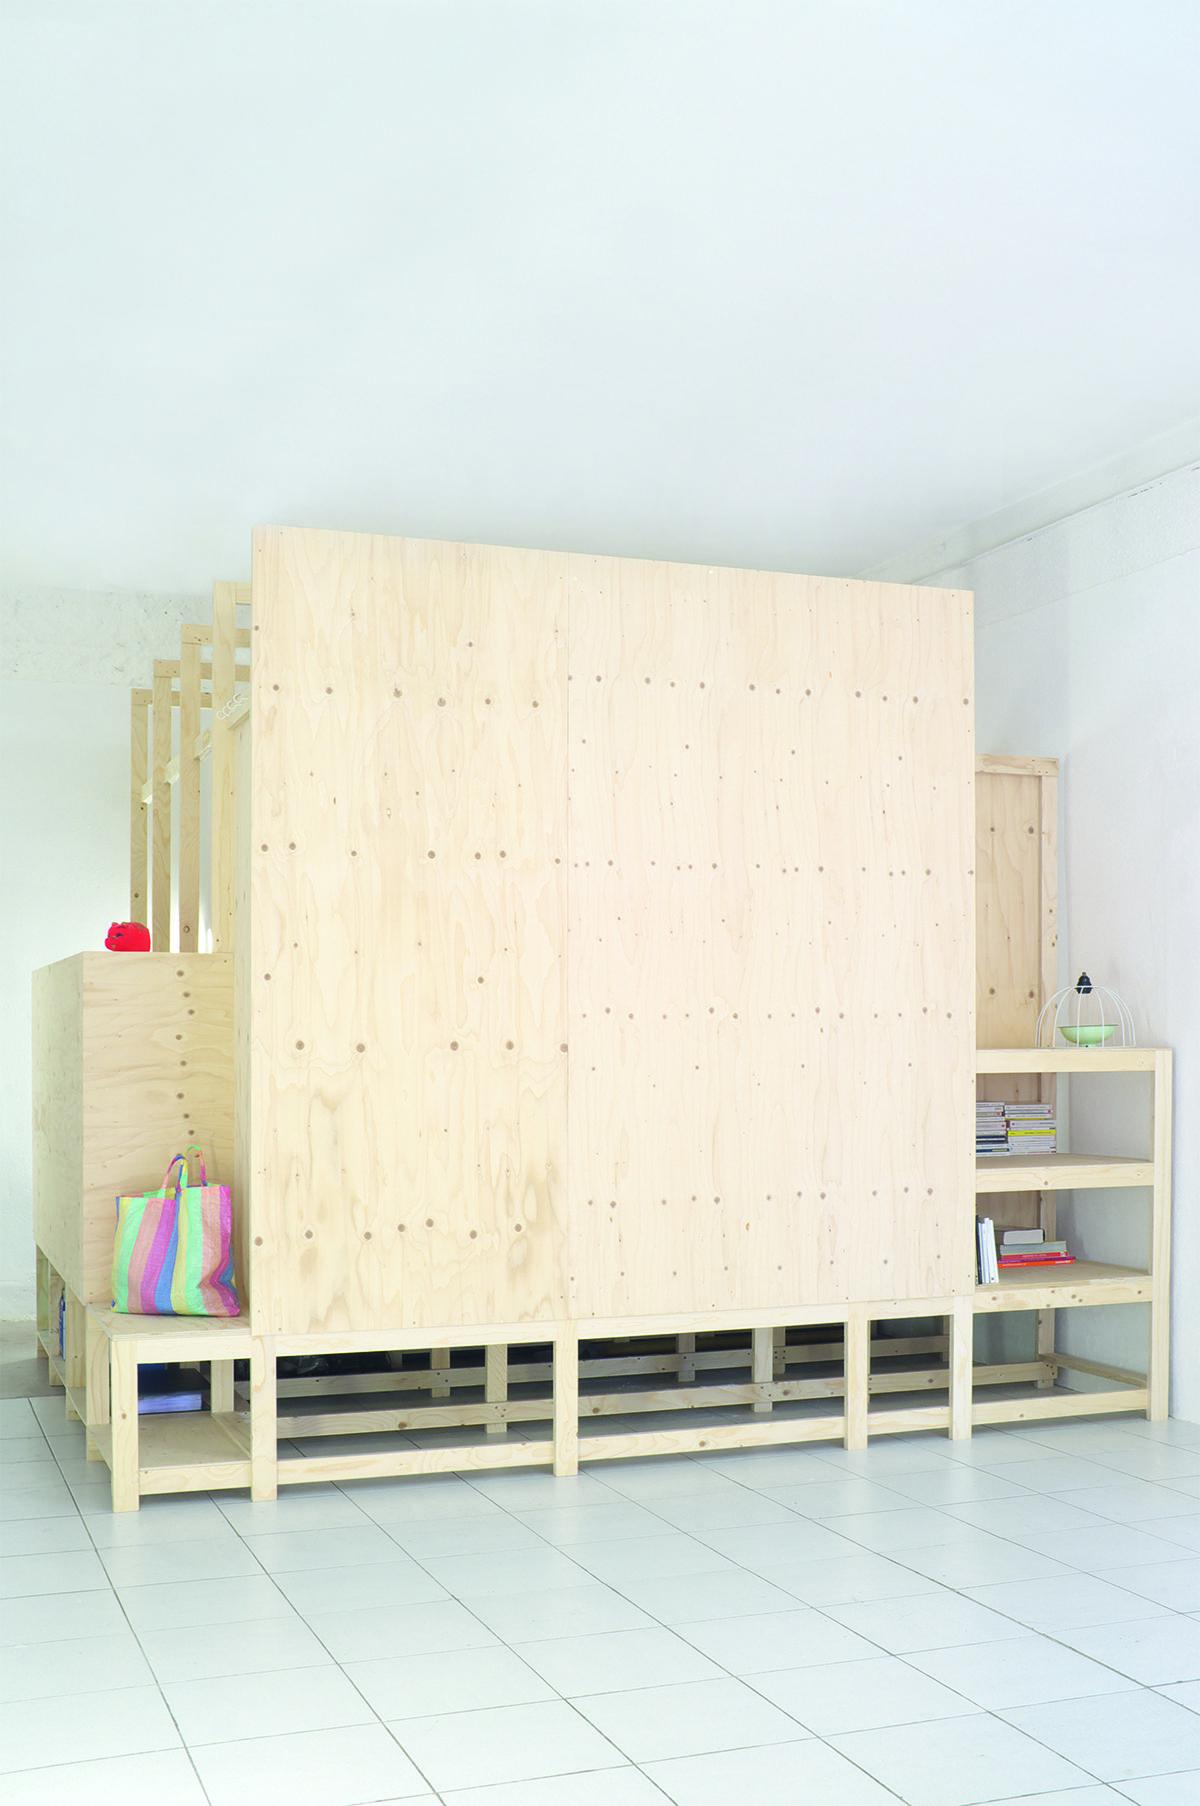 tea house meuble de repos 2013 contreplaqu pic a 300x240x213cm ce meuble lot permet de s. Black Bedroom Furniture Sets. Home Design Ideas